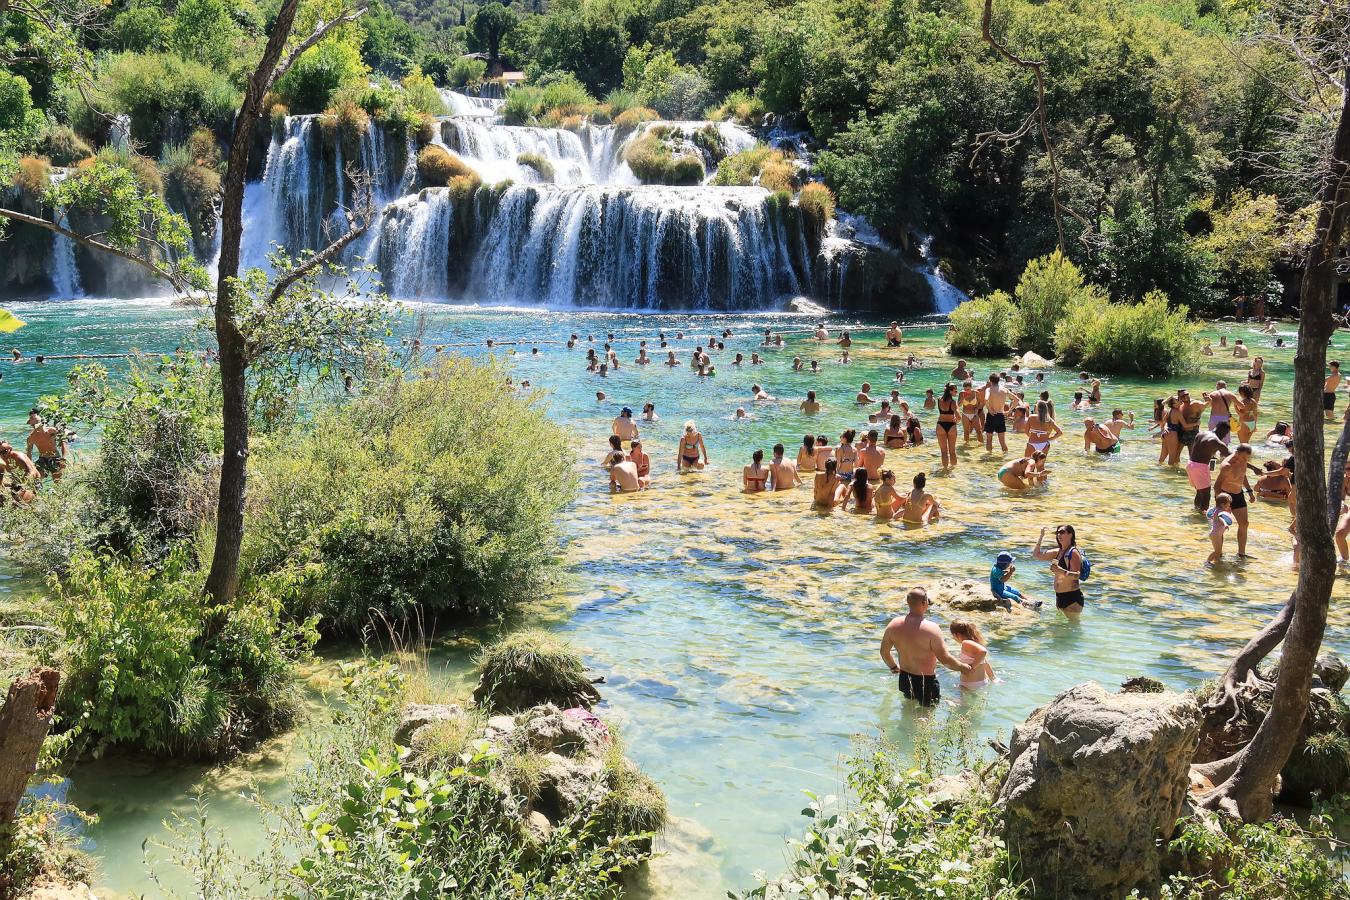 Skradinski Falls, Croatia on a summer day 20 August 2020